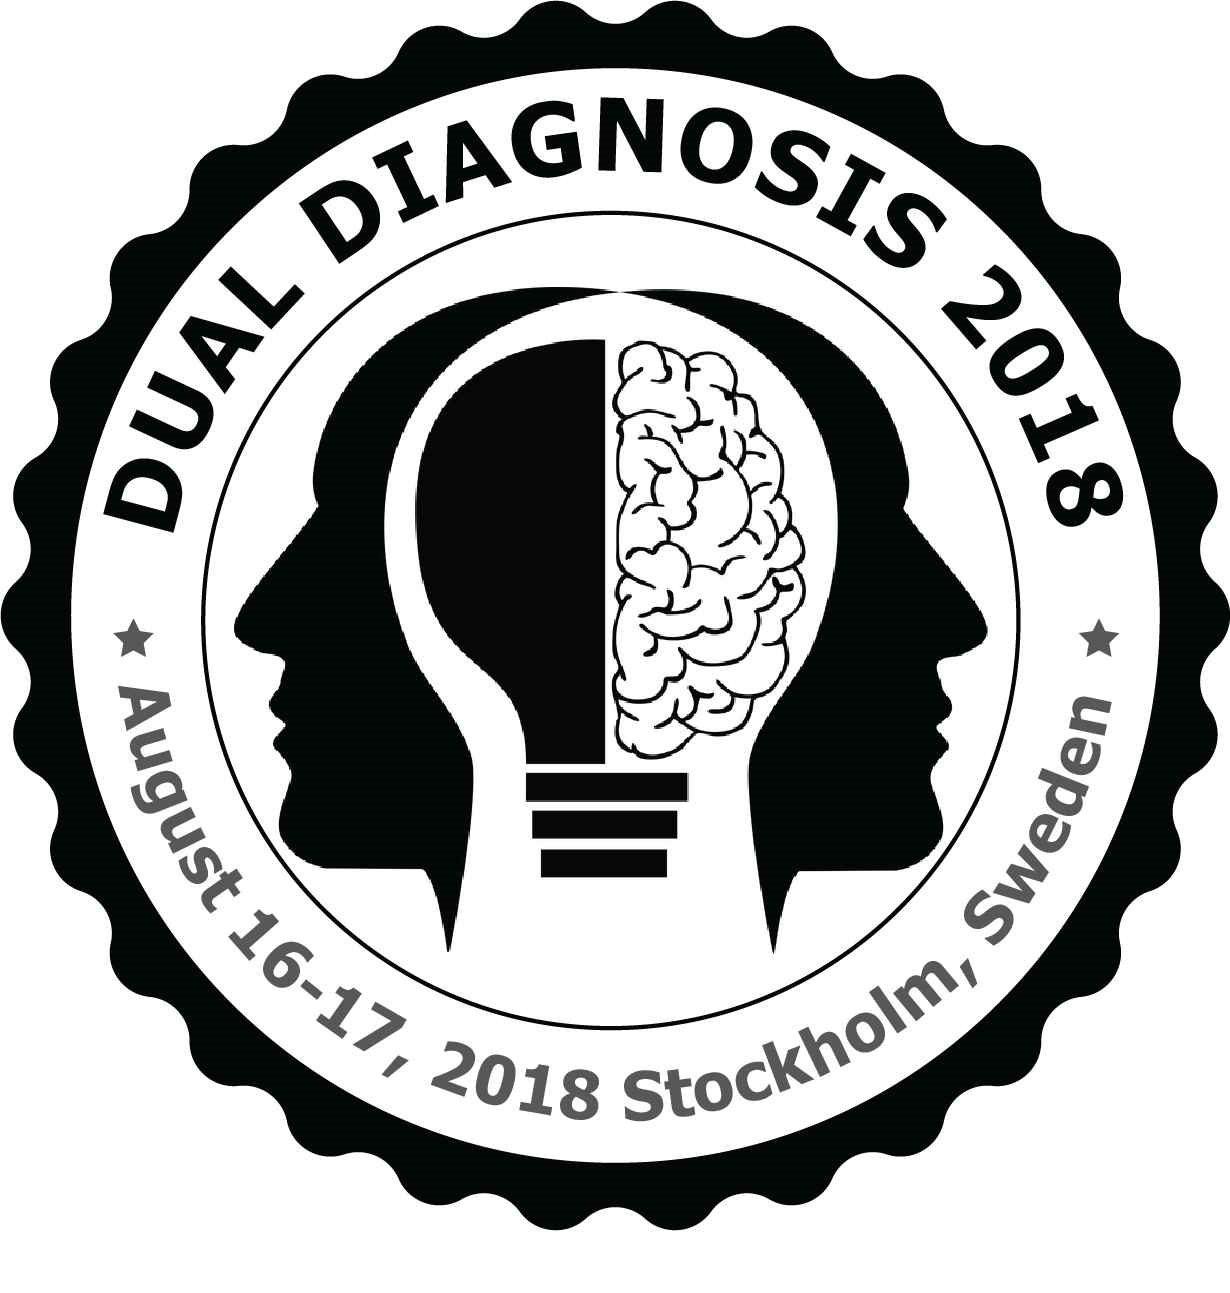 3rd International Congress on Addictive Behavior and Dual Diagnosis